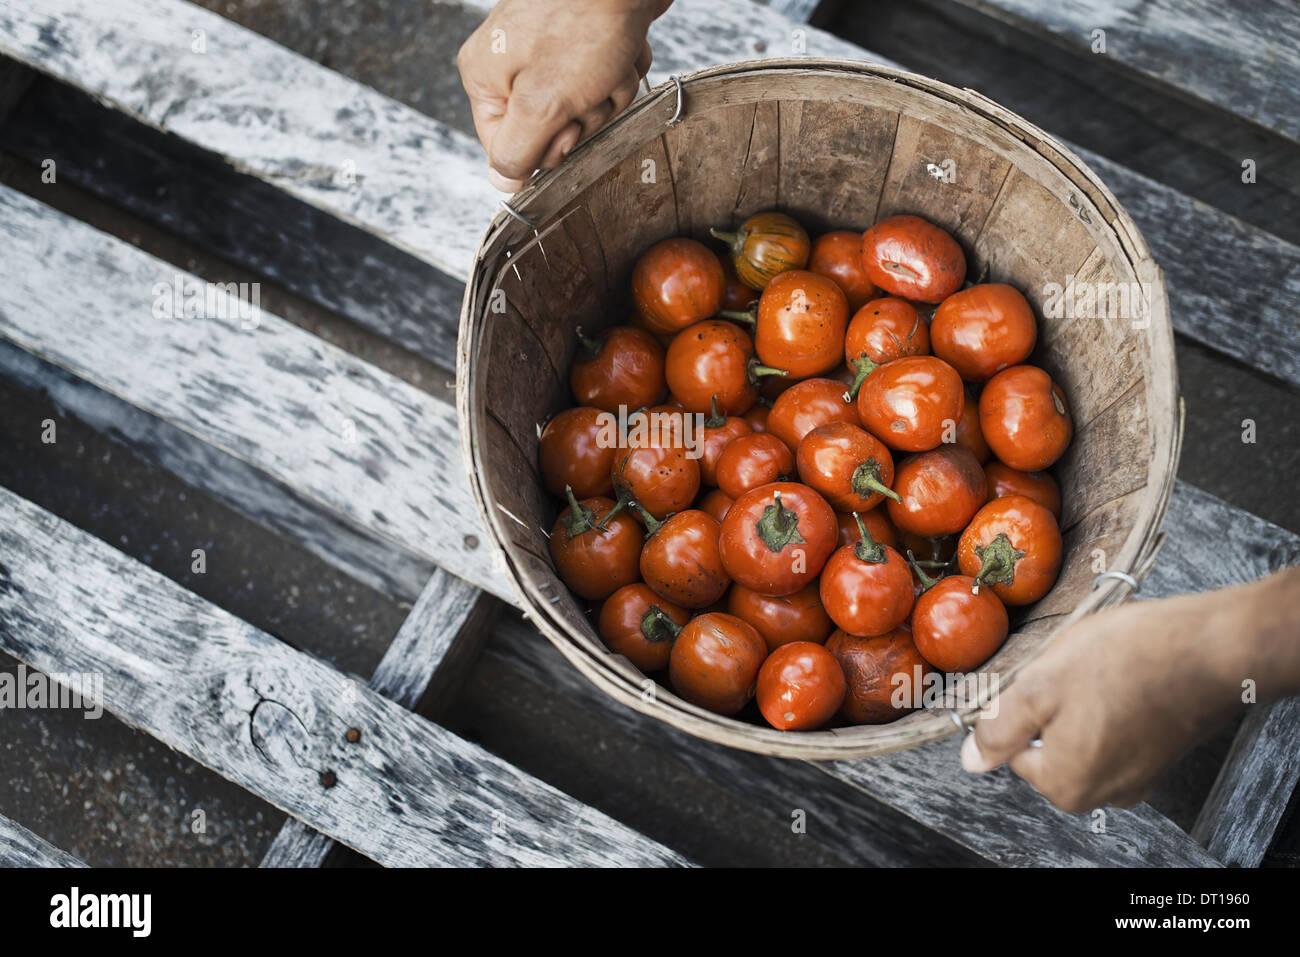 Woodstock New York USA Organic Hungarian Eggplants just harvested - Stock Image